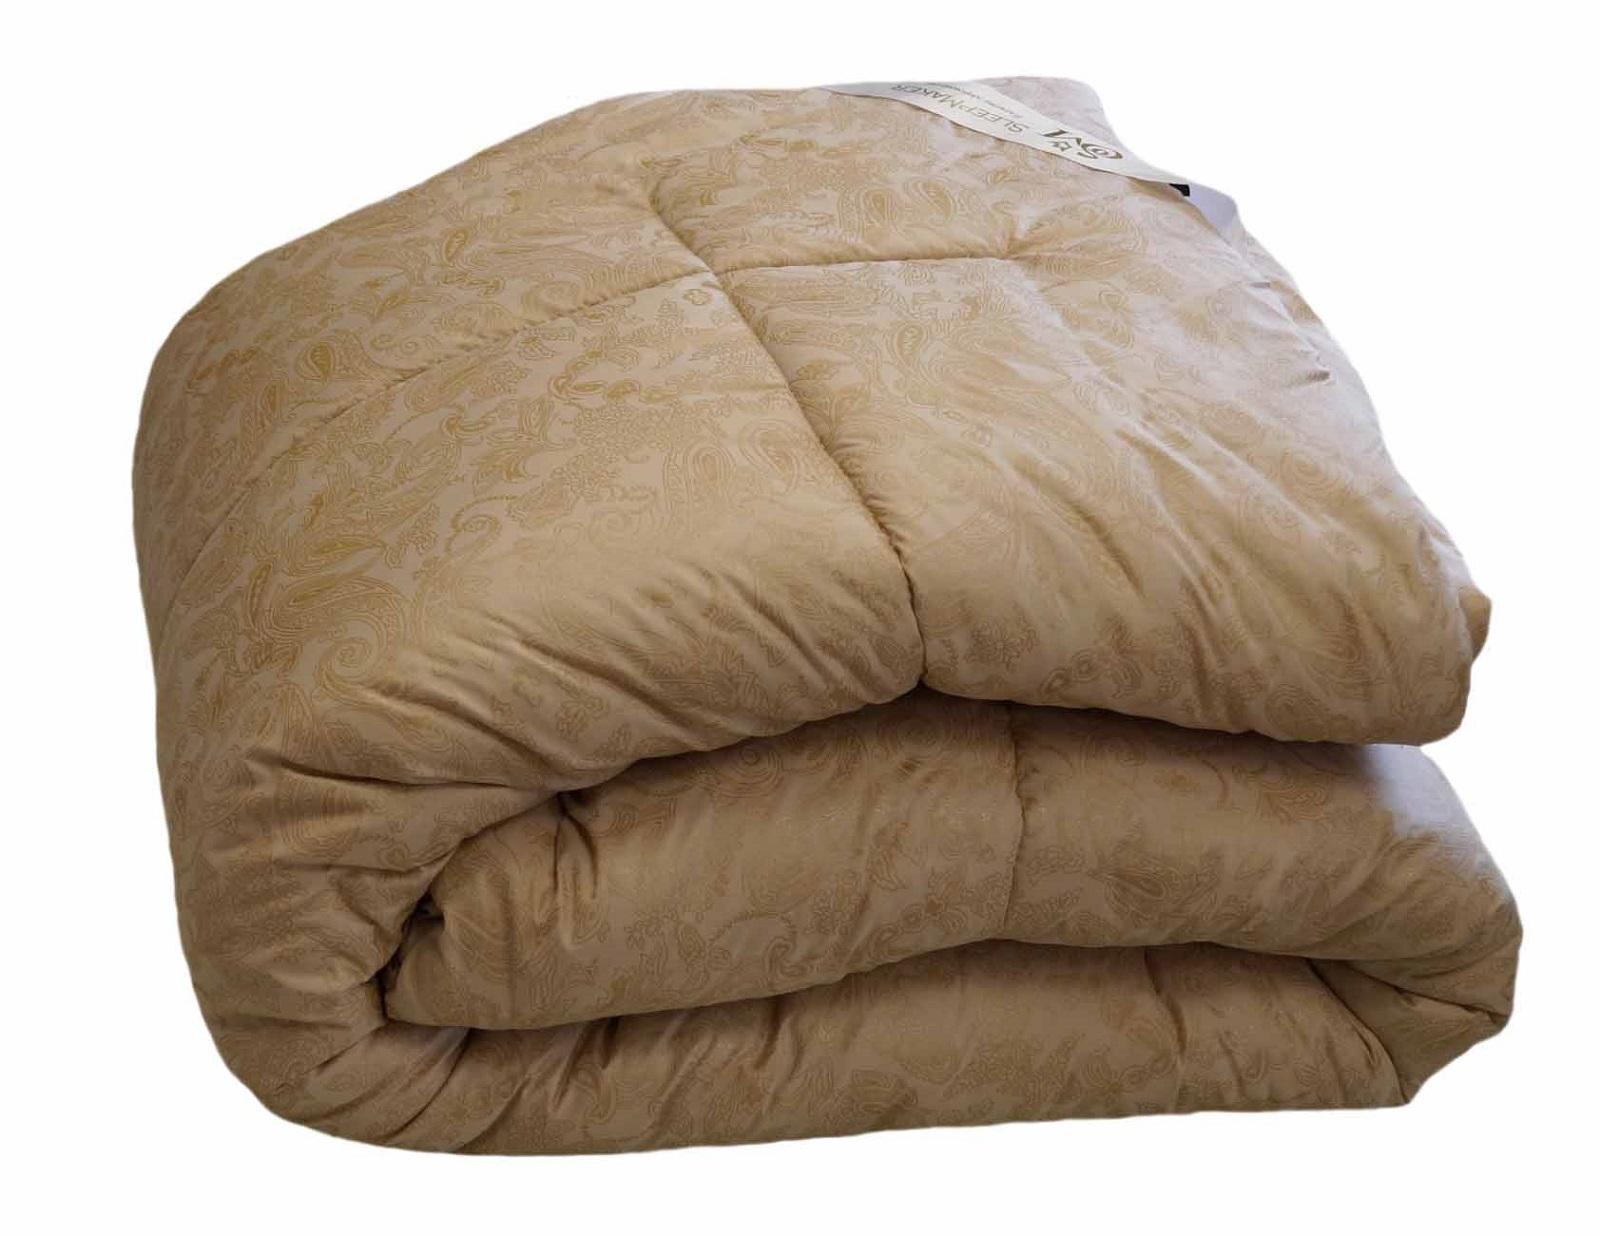 Всесезонное евро одеяло SleepMaker Eastern dreams 200*220см